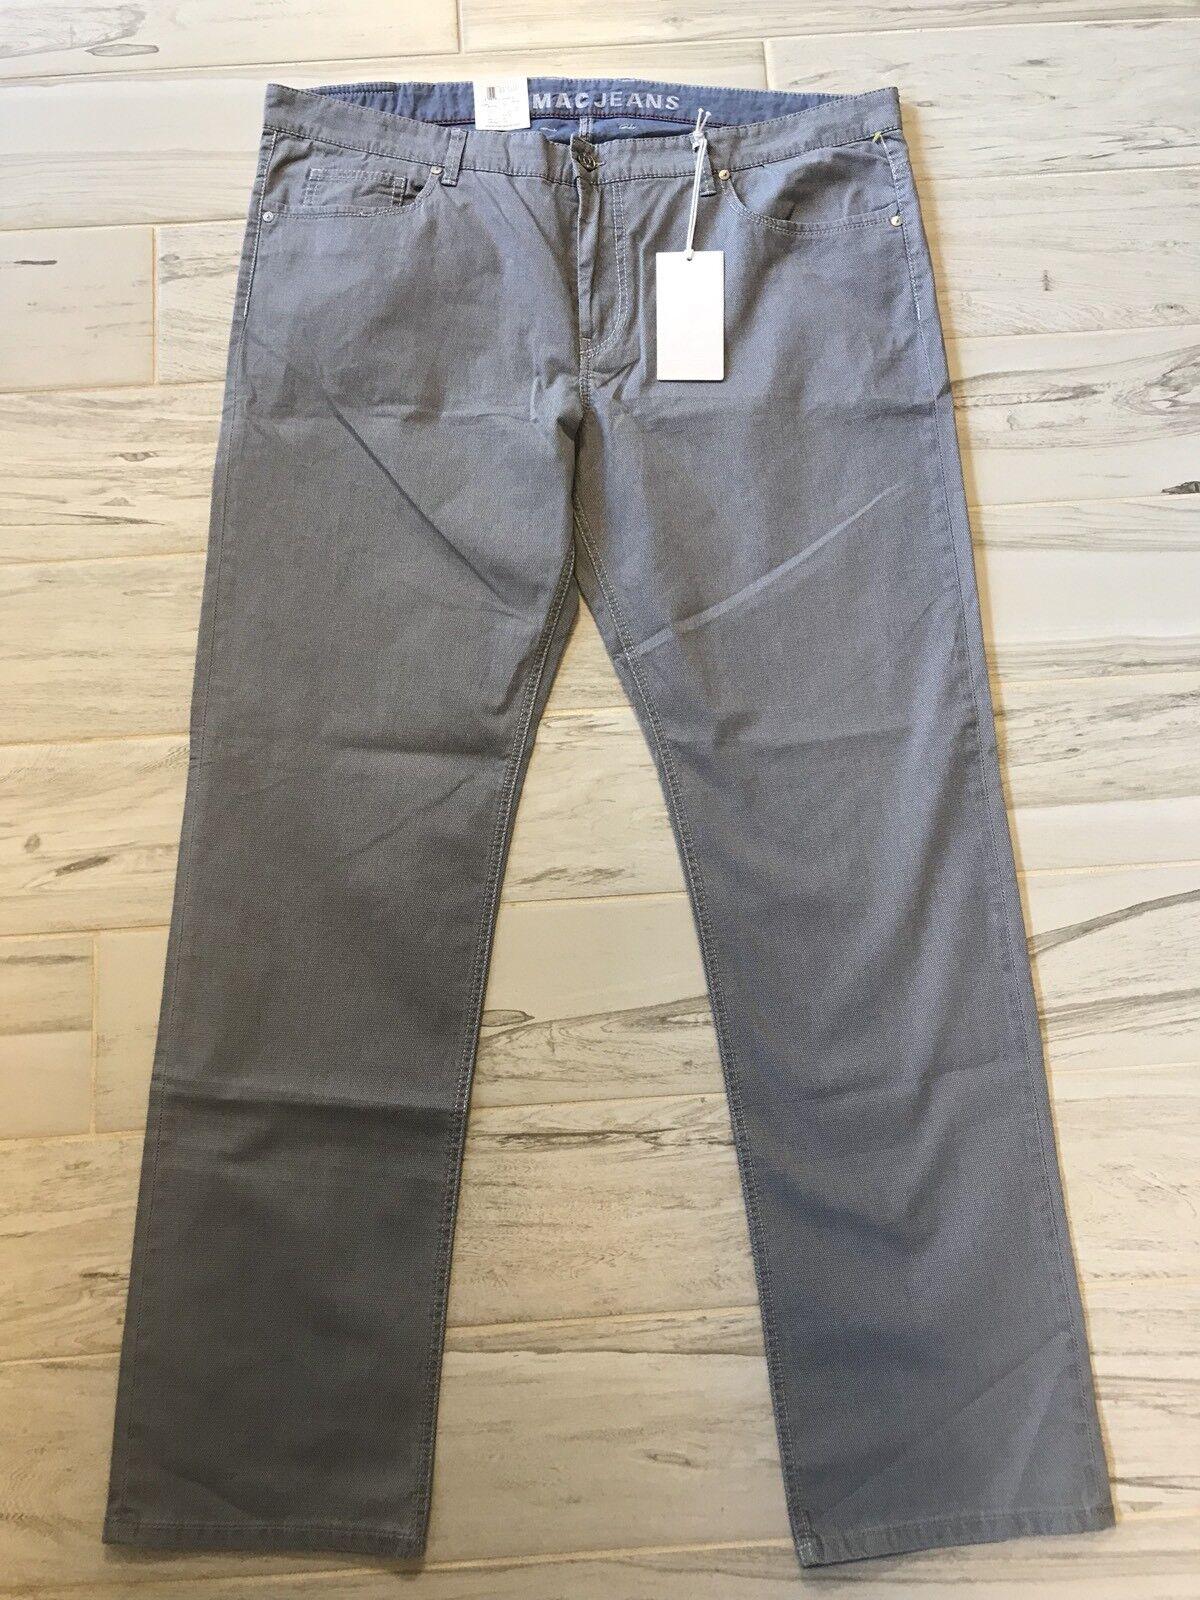 New Mac Mens Arne Jeans Pants bluee Modern Fit - Size W42 X L34